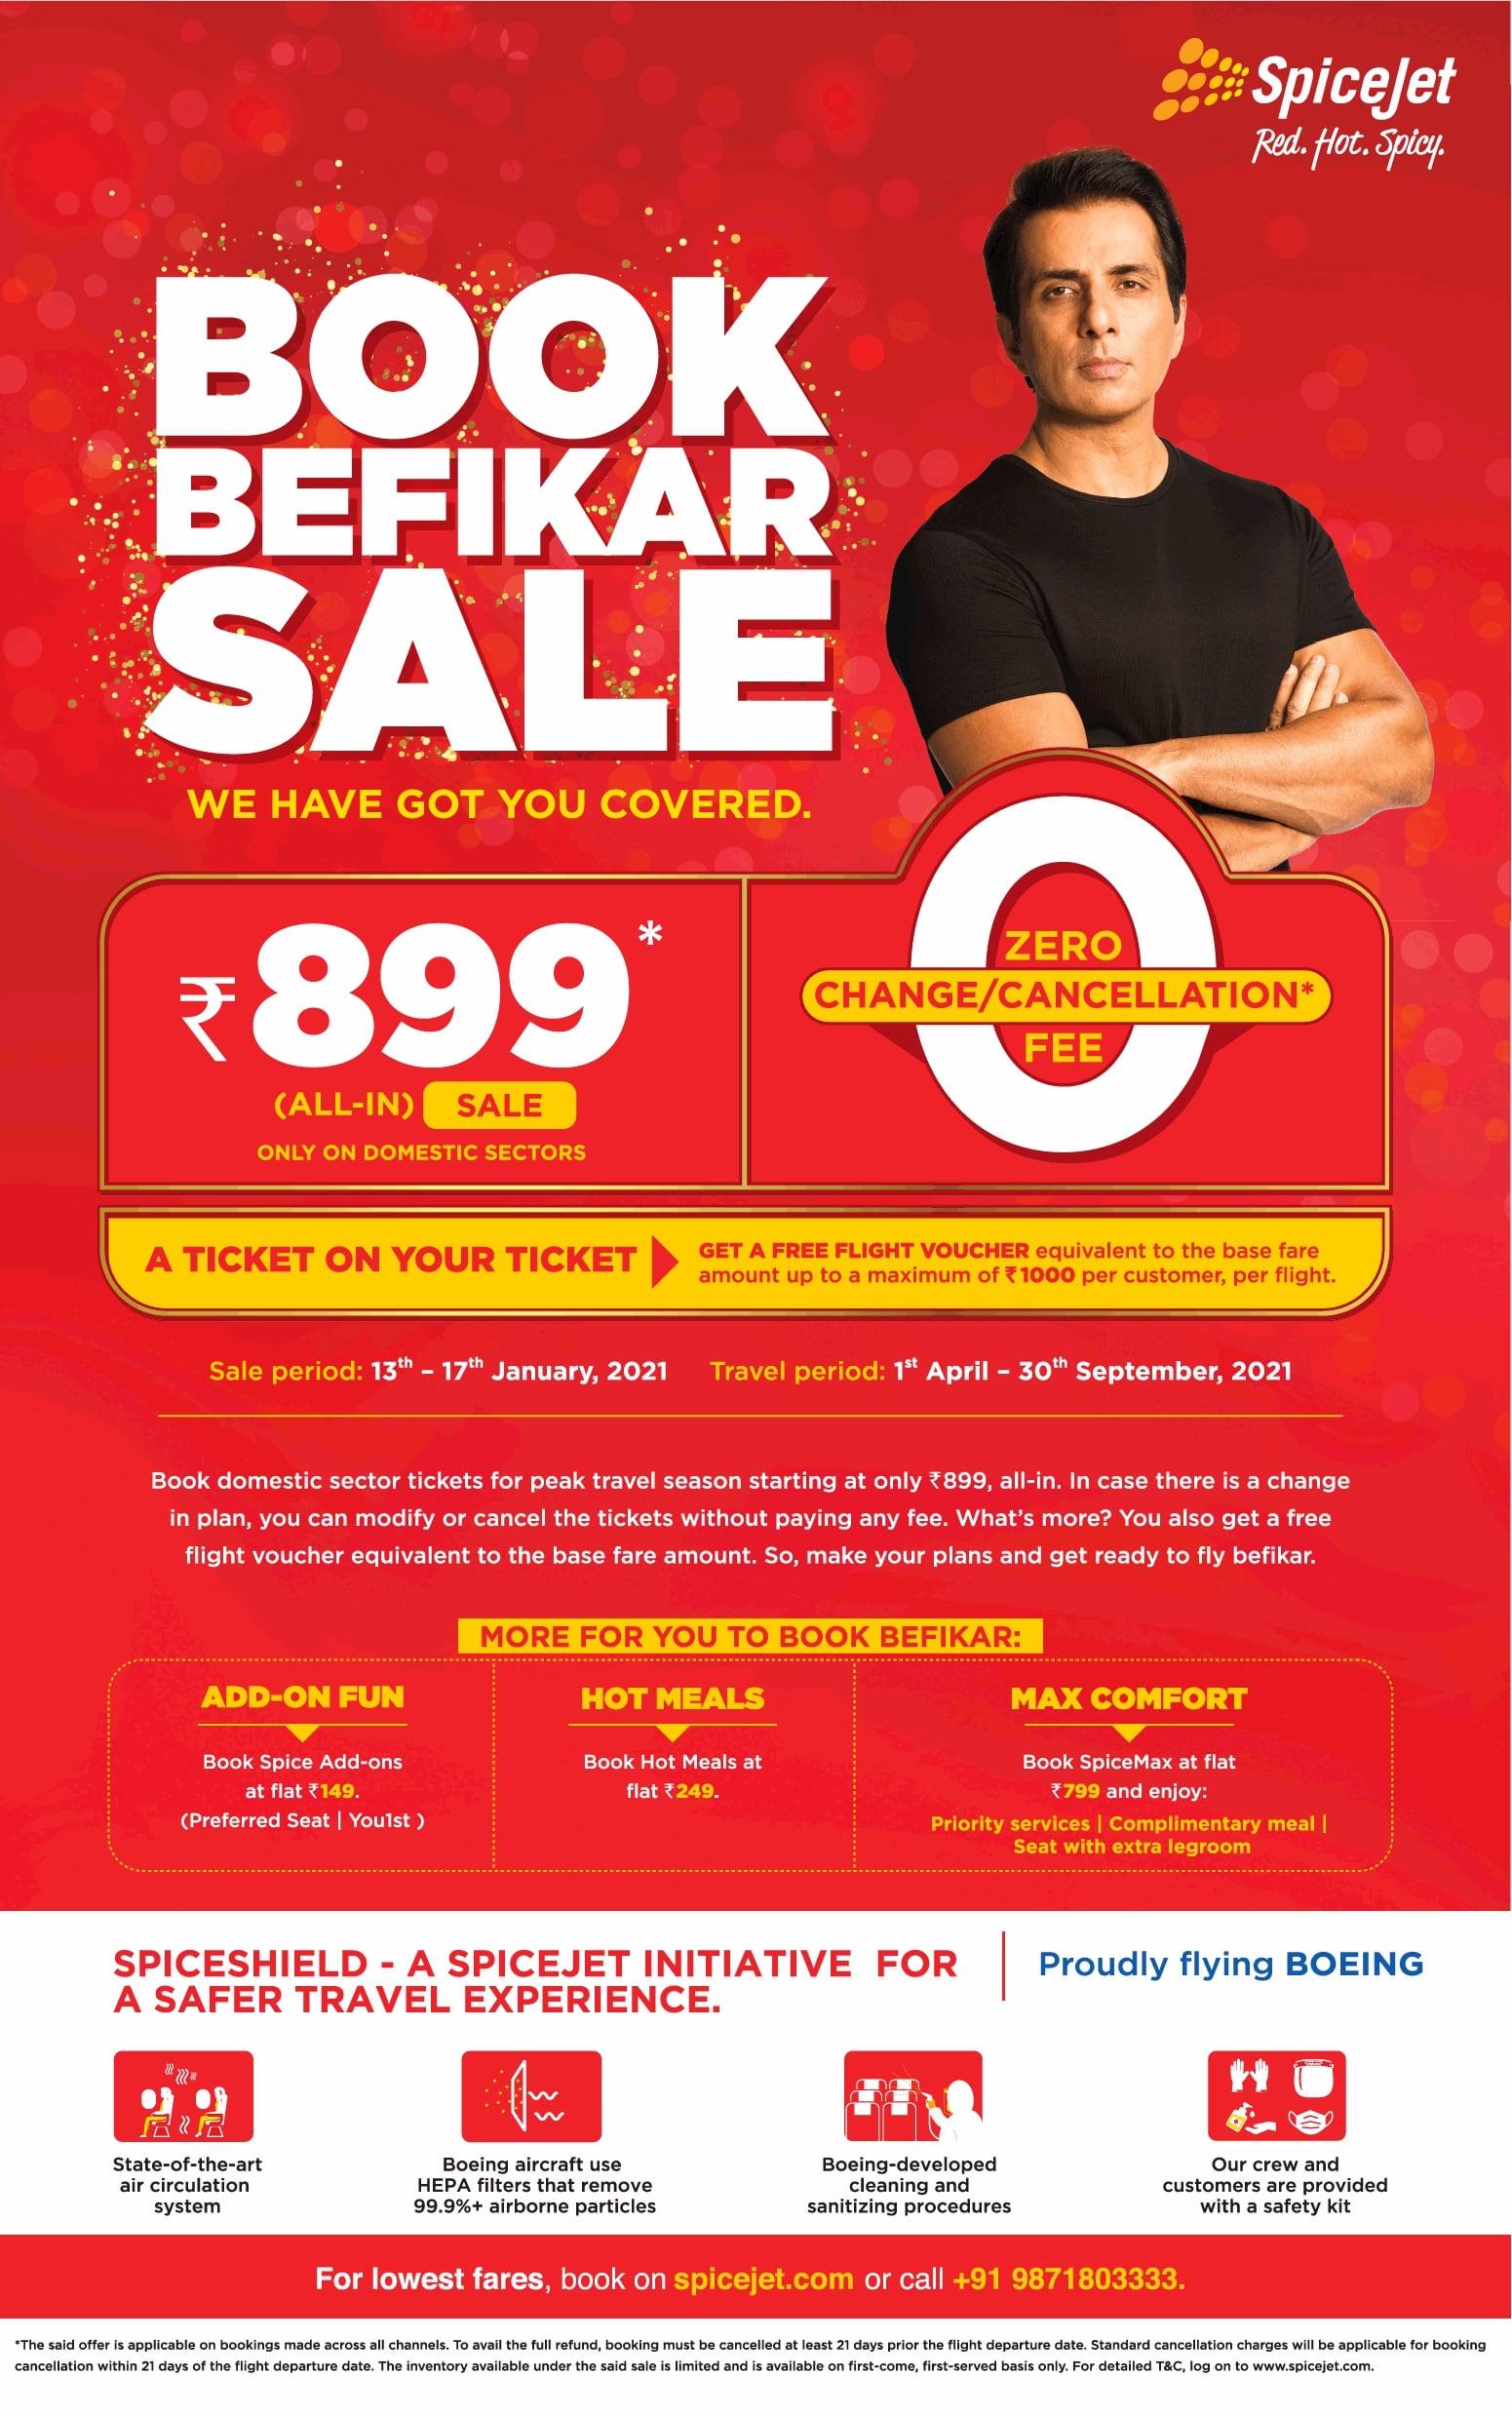 spice-jet-book-befikar-sale-ad-times-of-india-delhi-13-01-2021